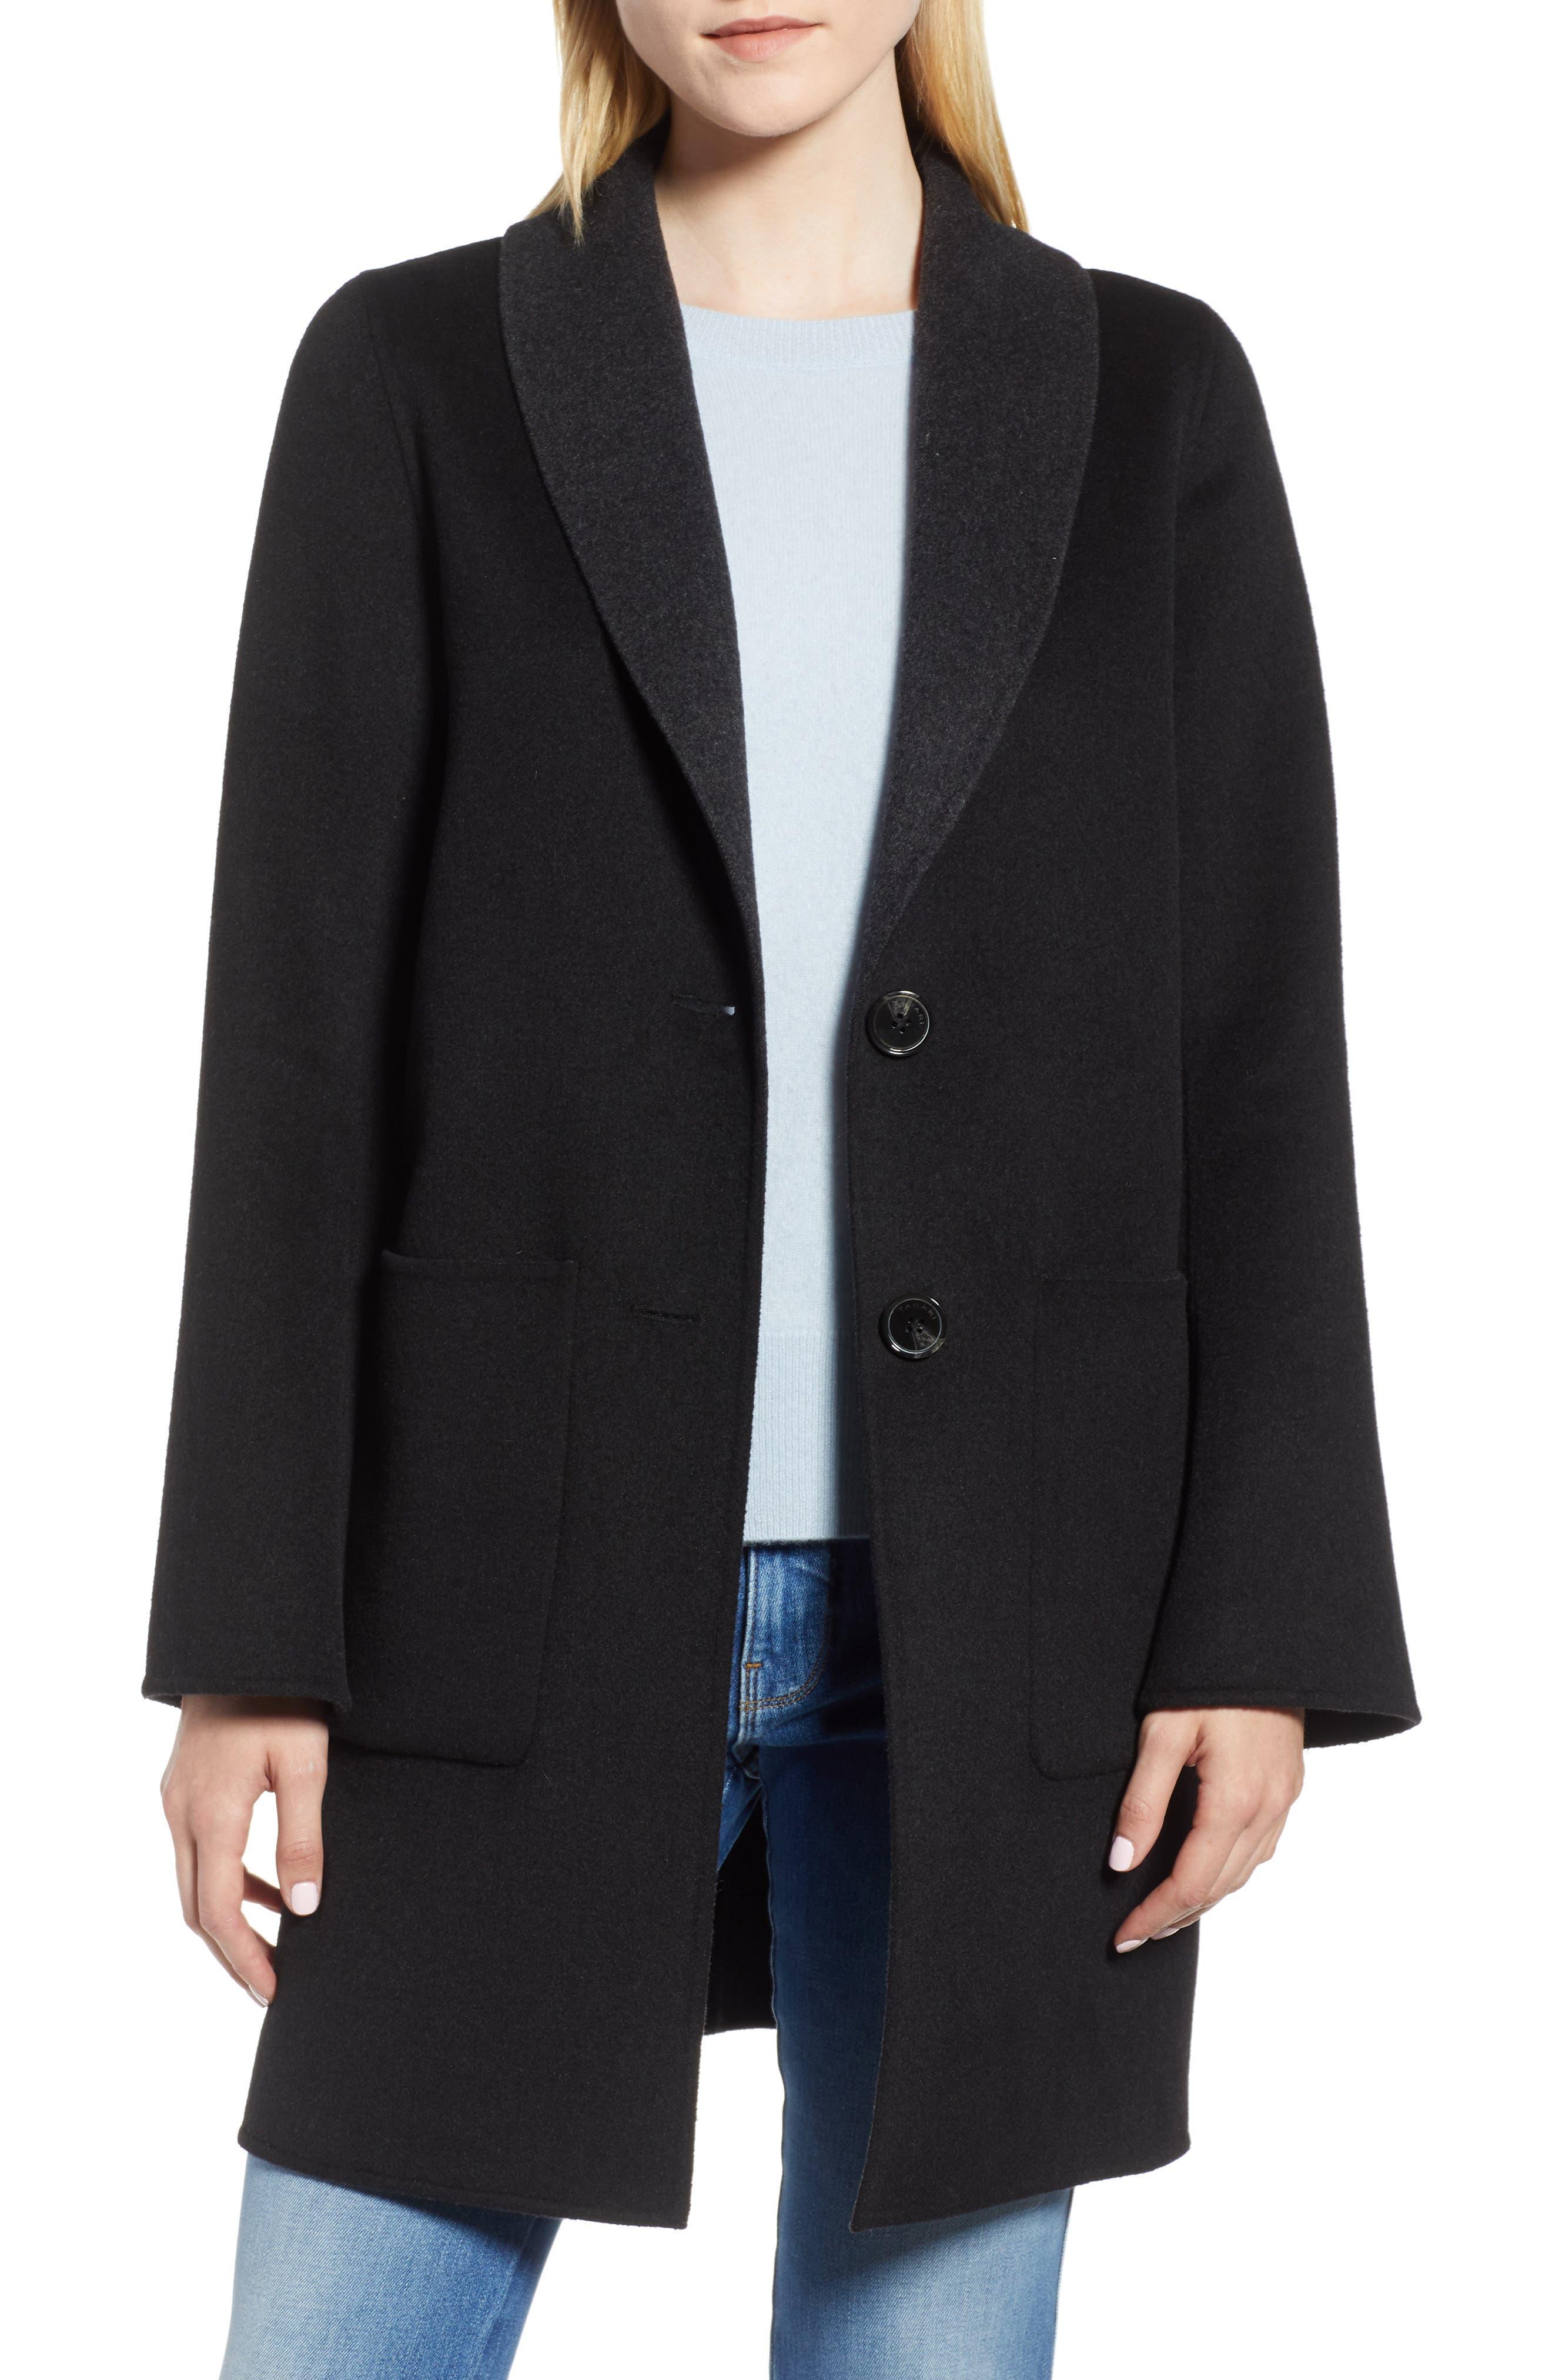 Jenn Double Face Wool Blend Reversible Coat,                         Main,                         color, 016